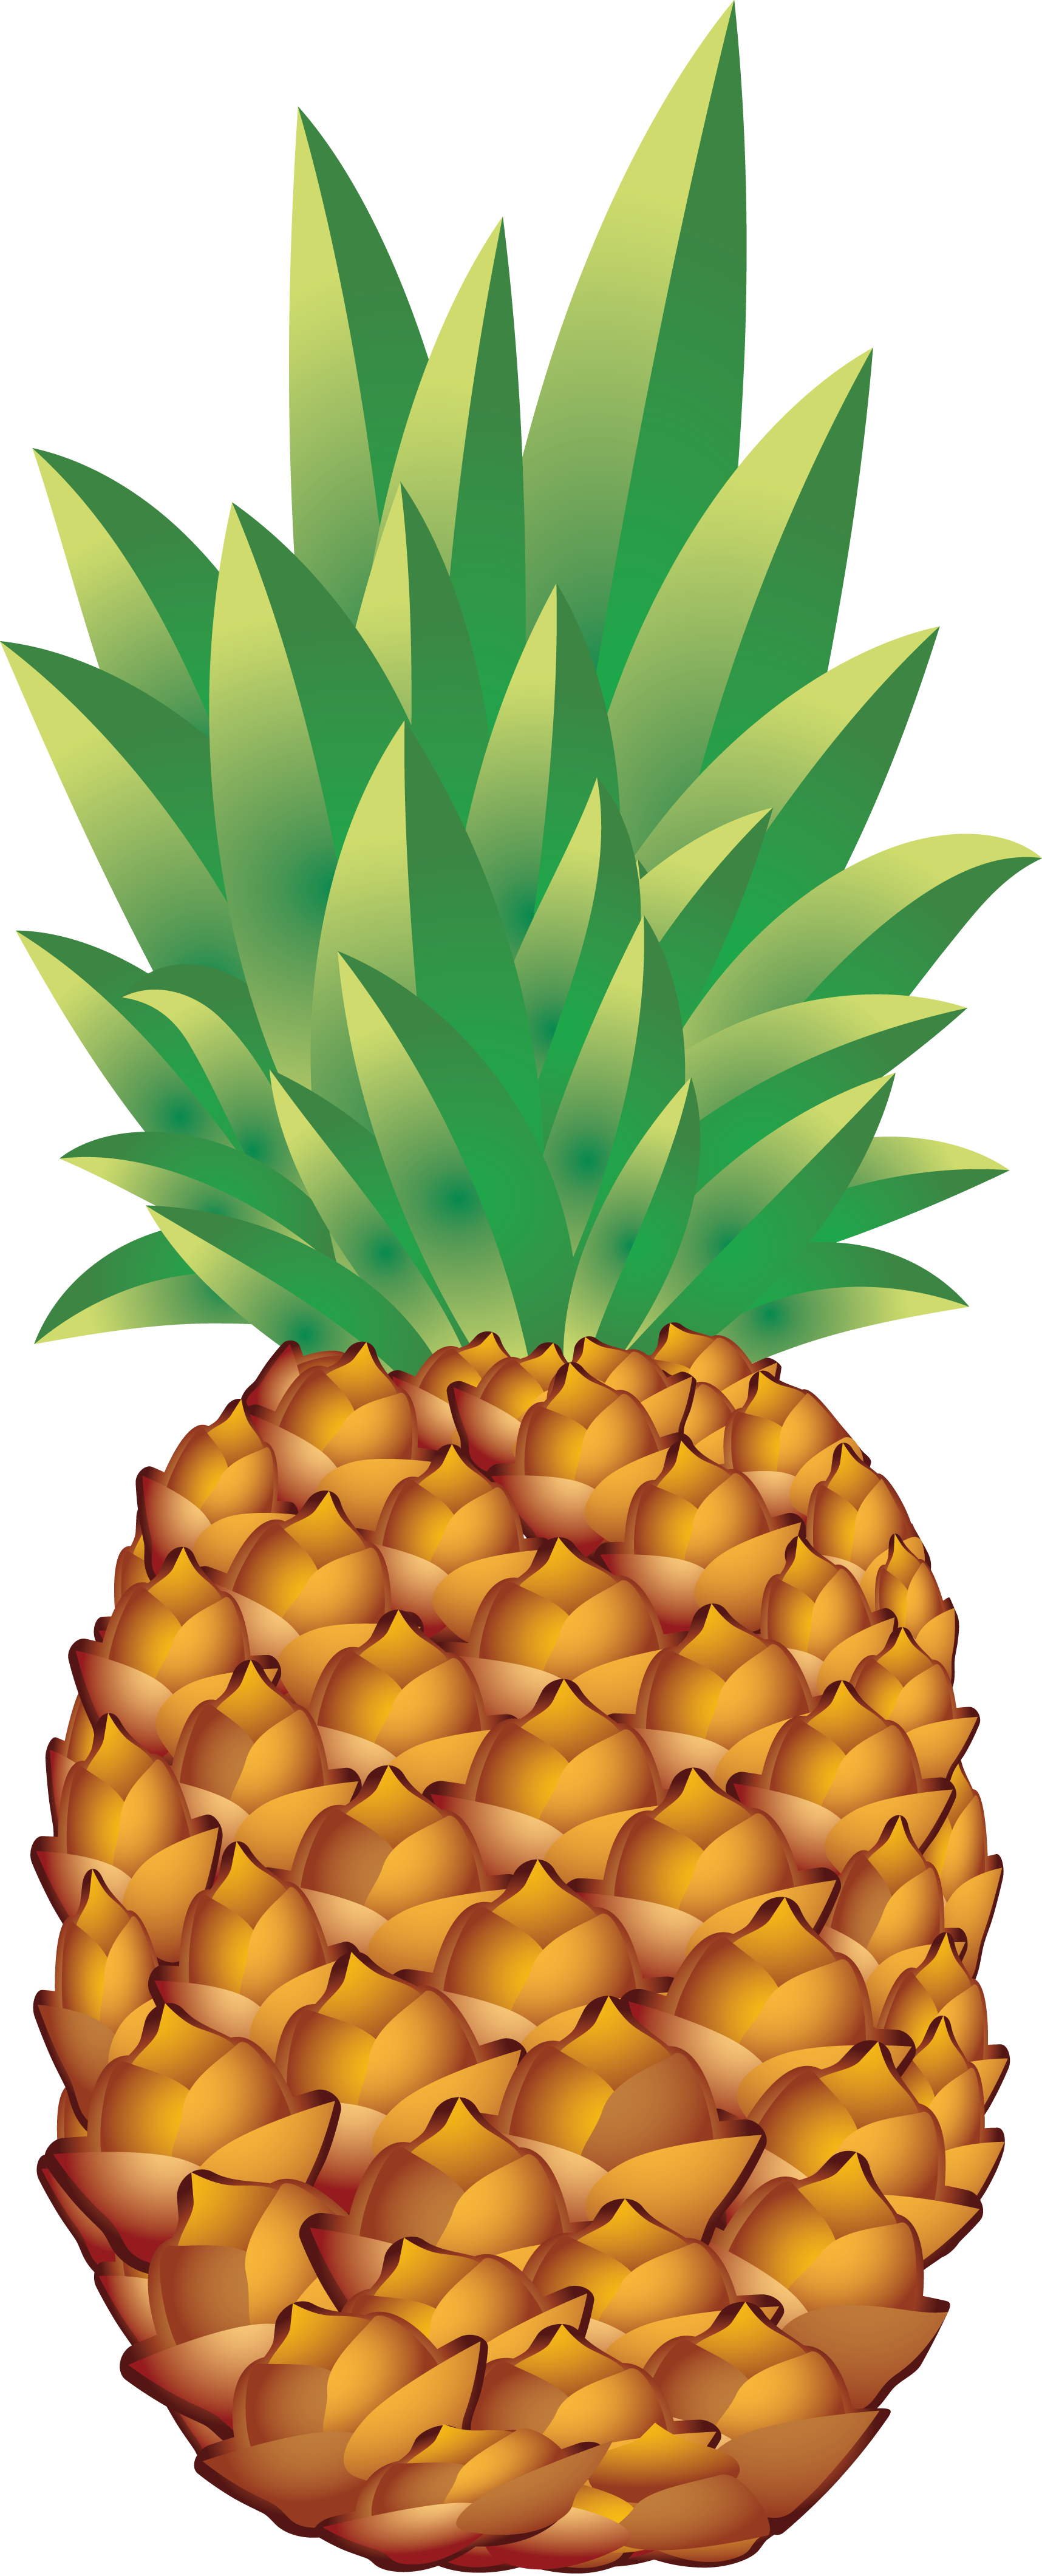 Pineapple Png Image Pineapple Pinapple Tumblr Pineapple